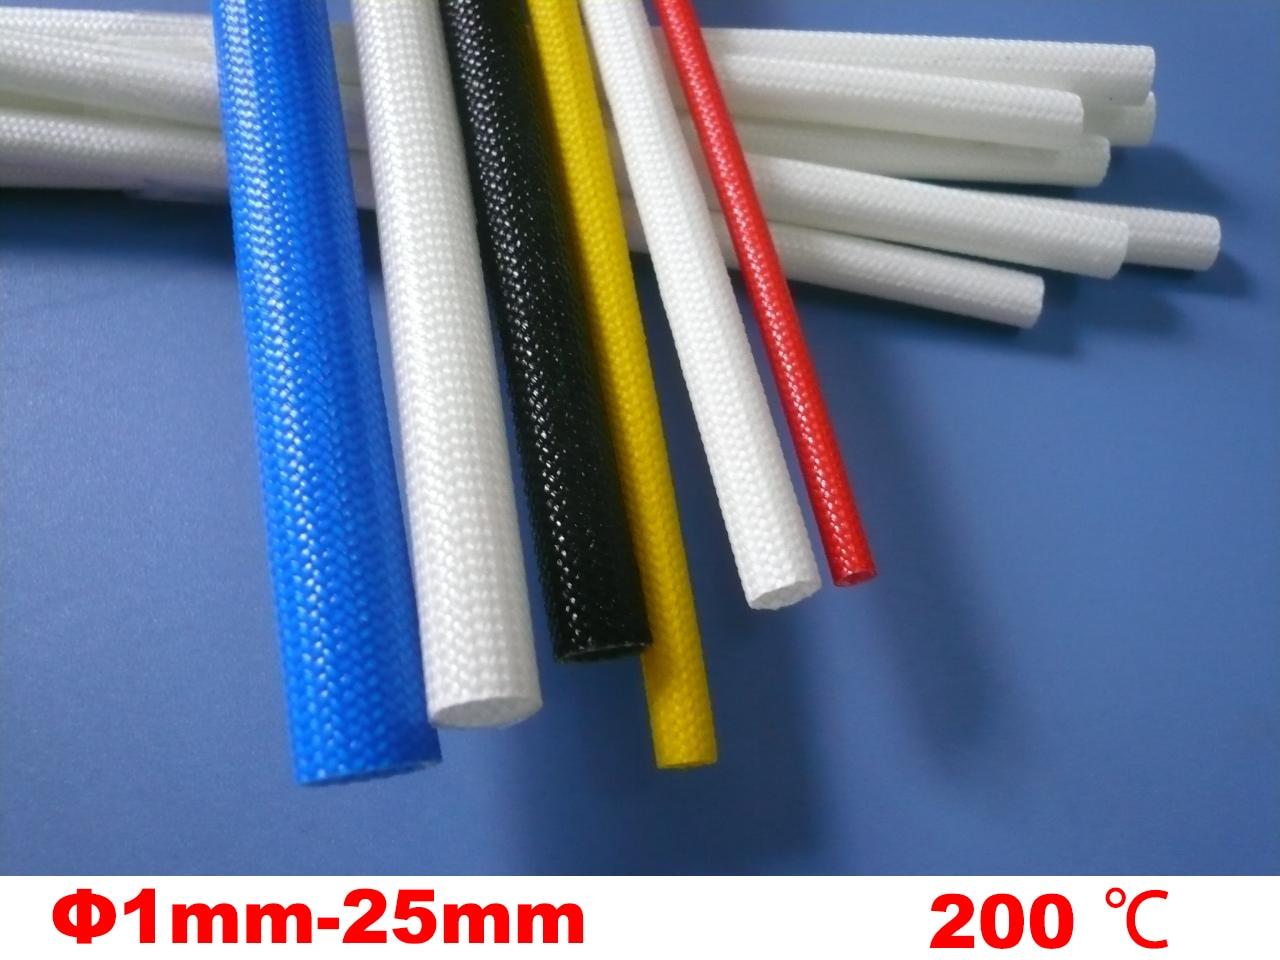 6M 8mm Black White 200 Deg C High Temperature off-Self Casing Pipe Silicone Resin Braided Glass Fiber Sleeve Fiberglass Tube